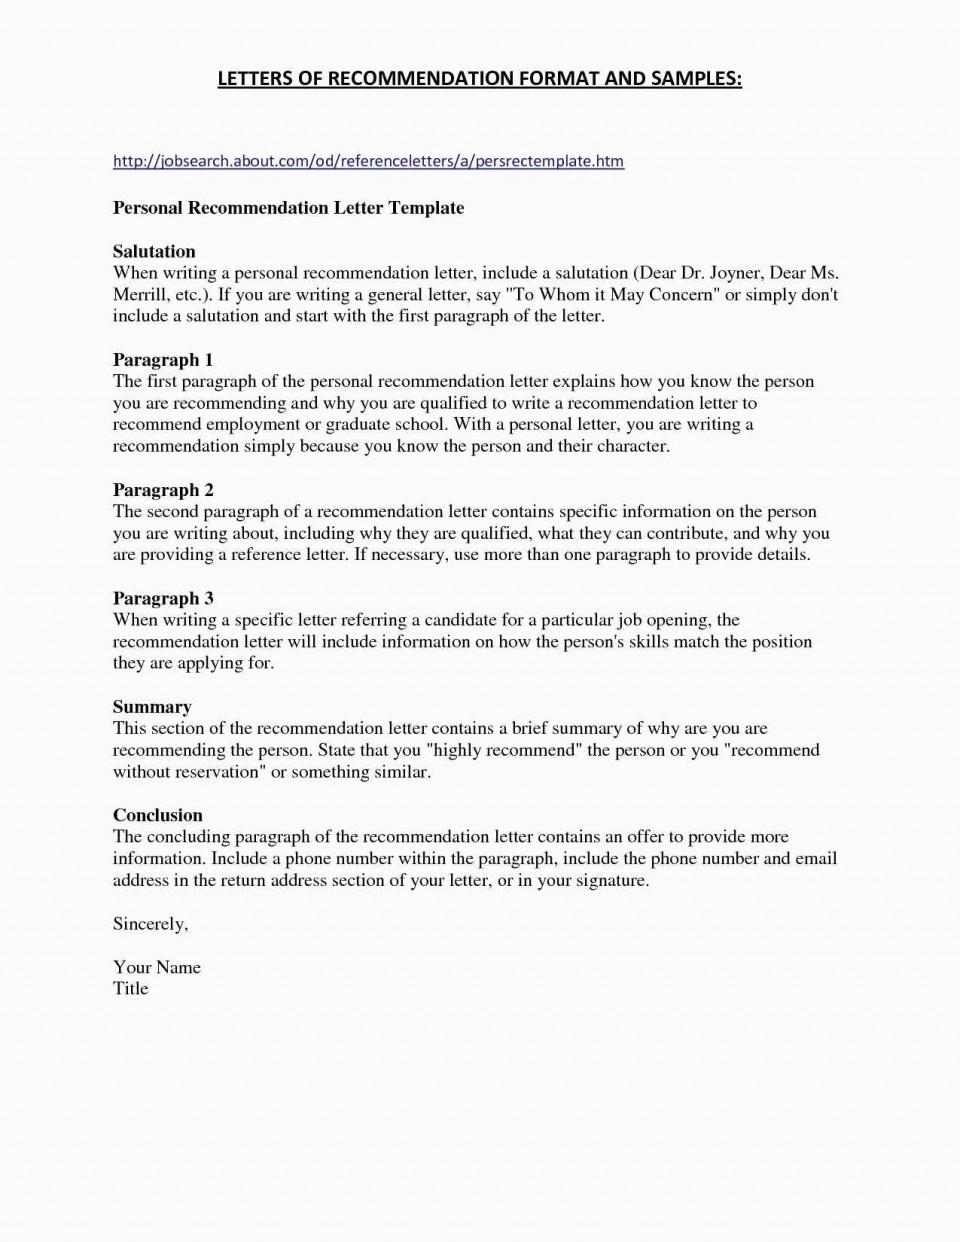 Apa format Template Open Office Best Of 011 Free Apa format Template Ideas Paper Ulyssesroom